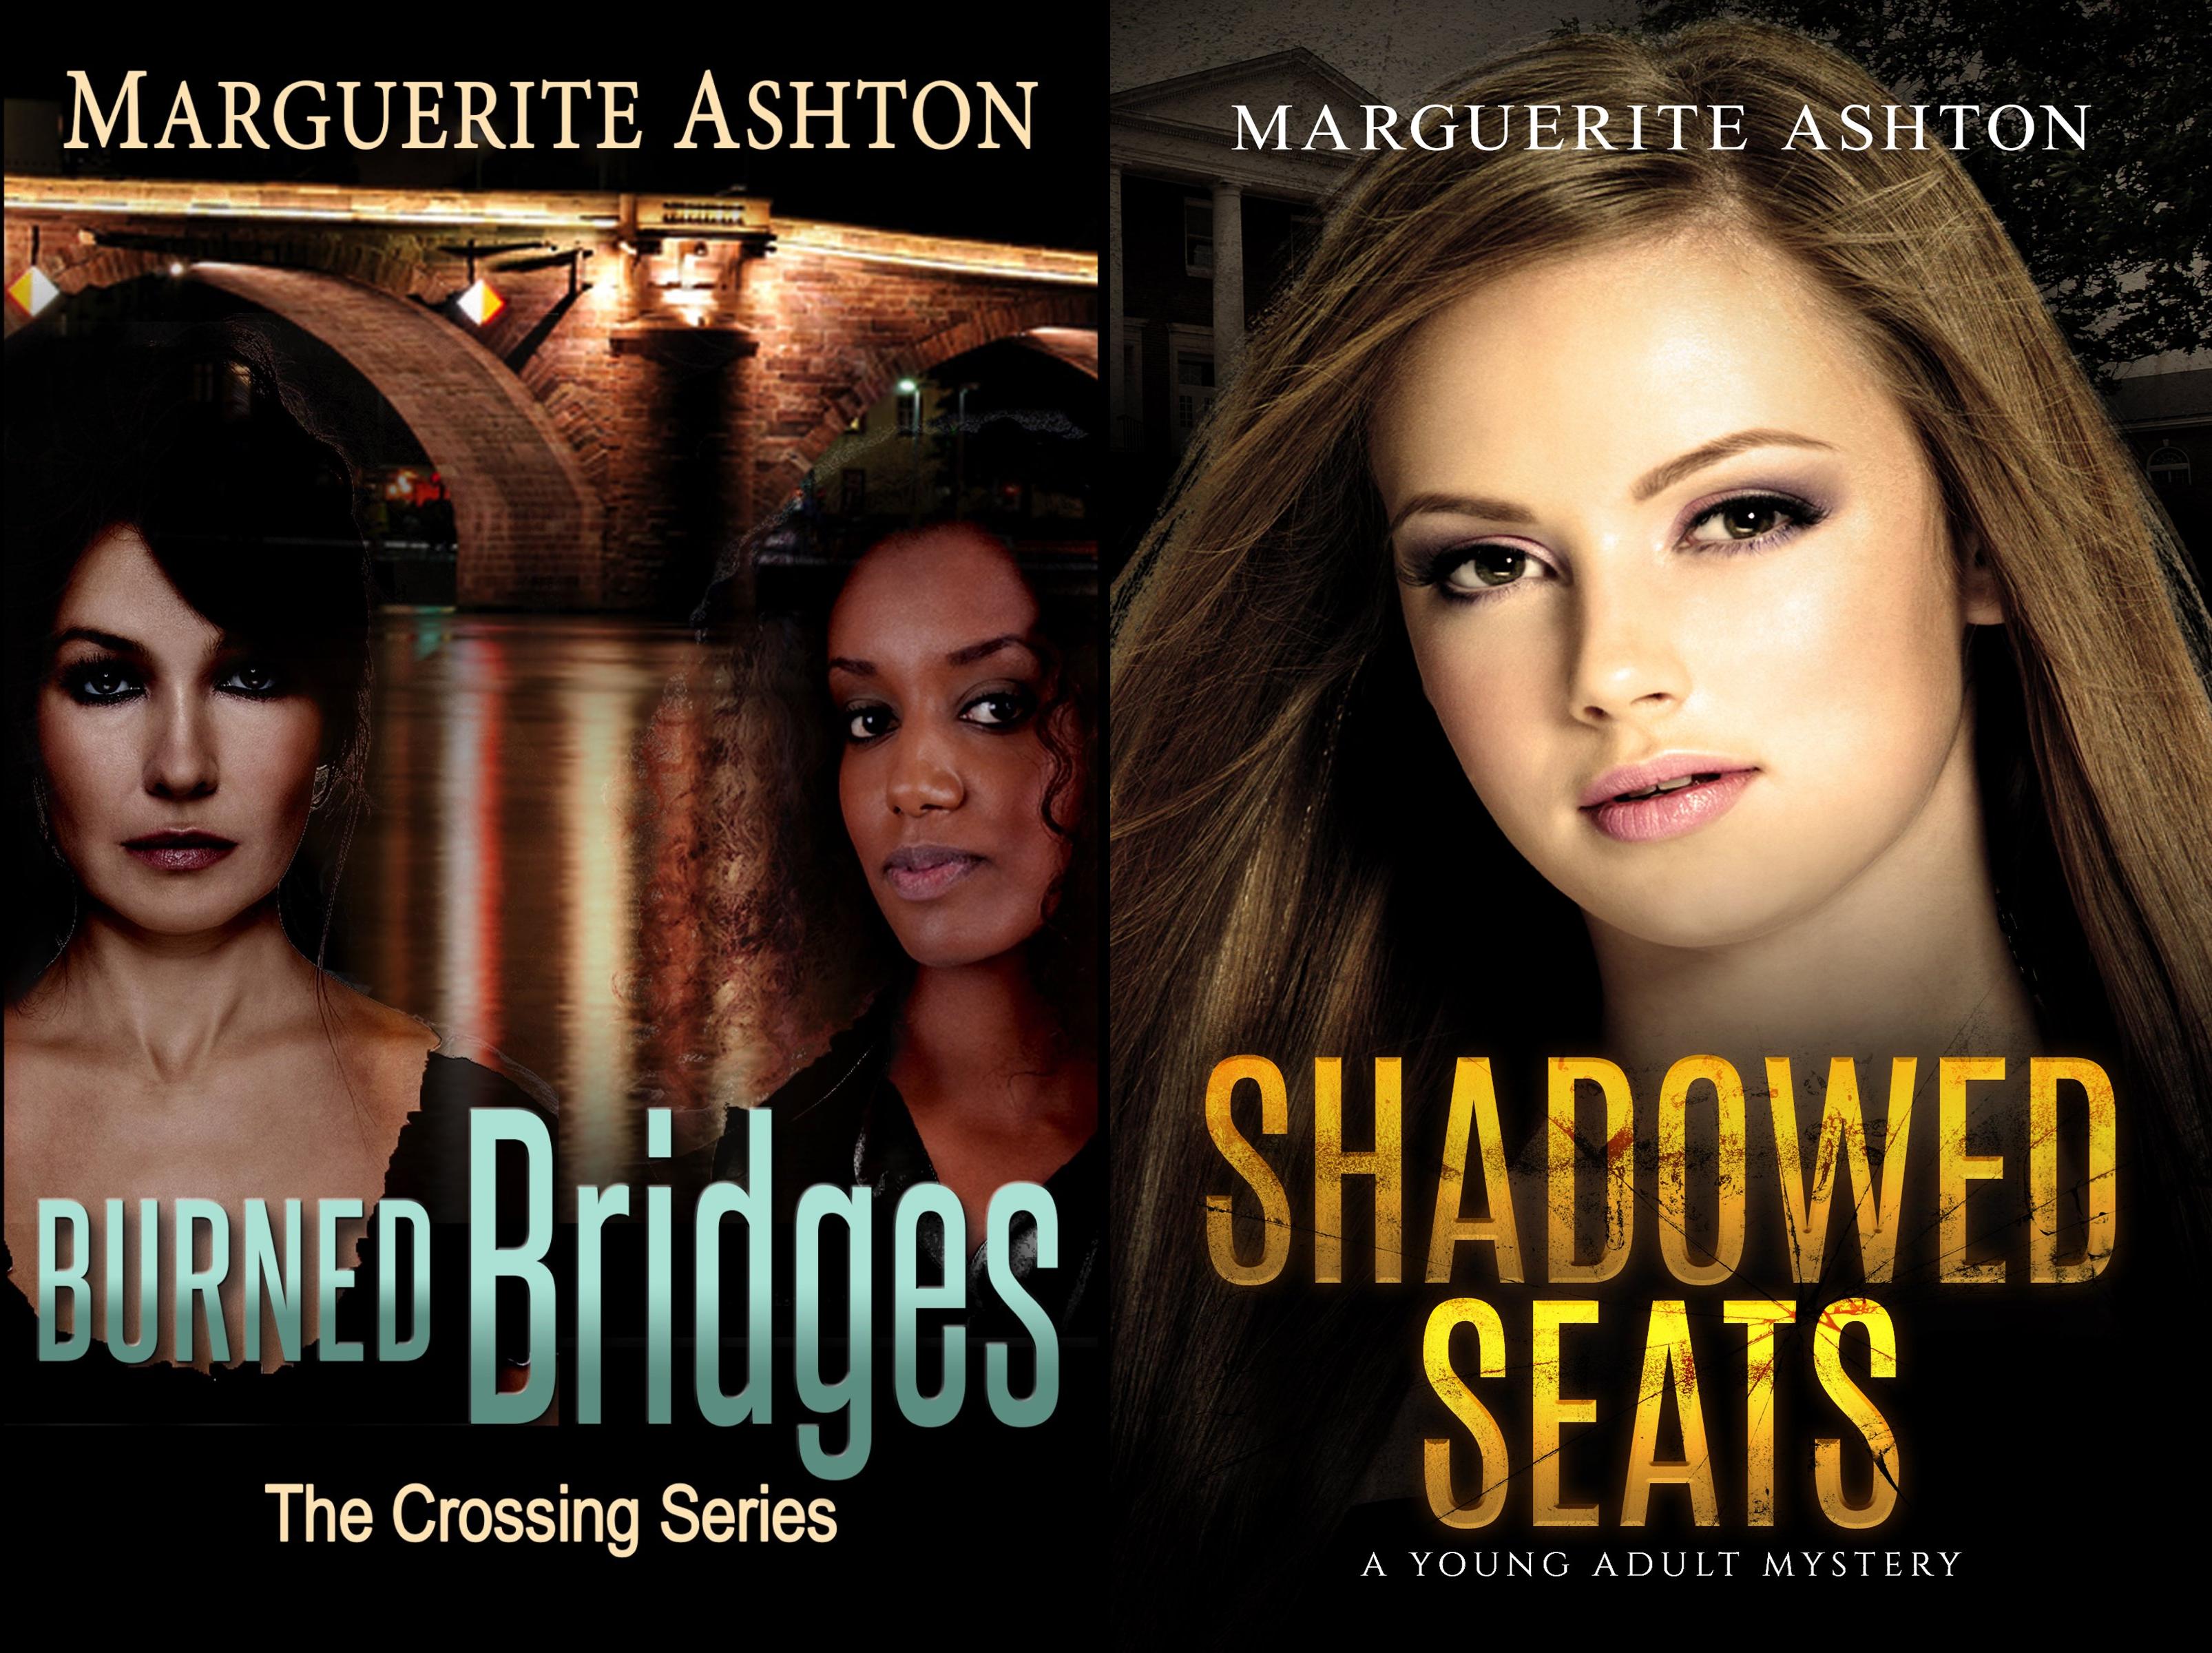 The Crossing Series (2 Book Series)